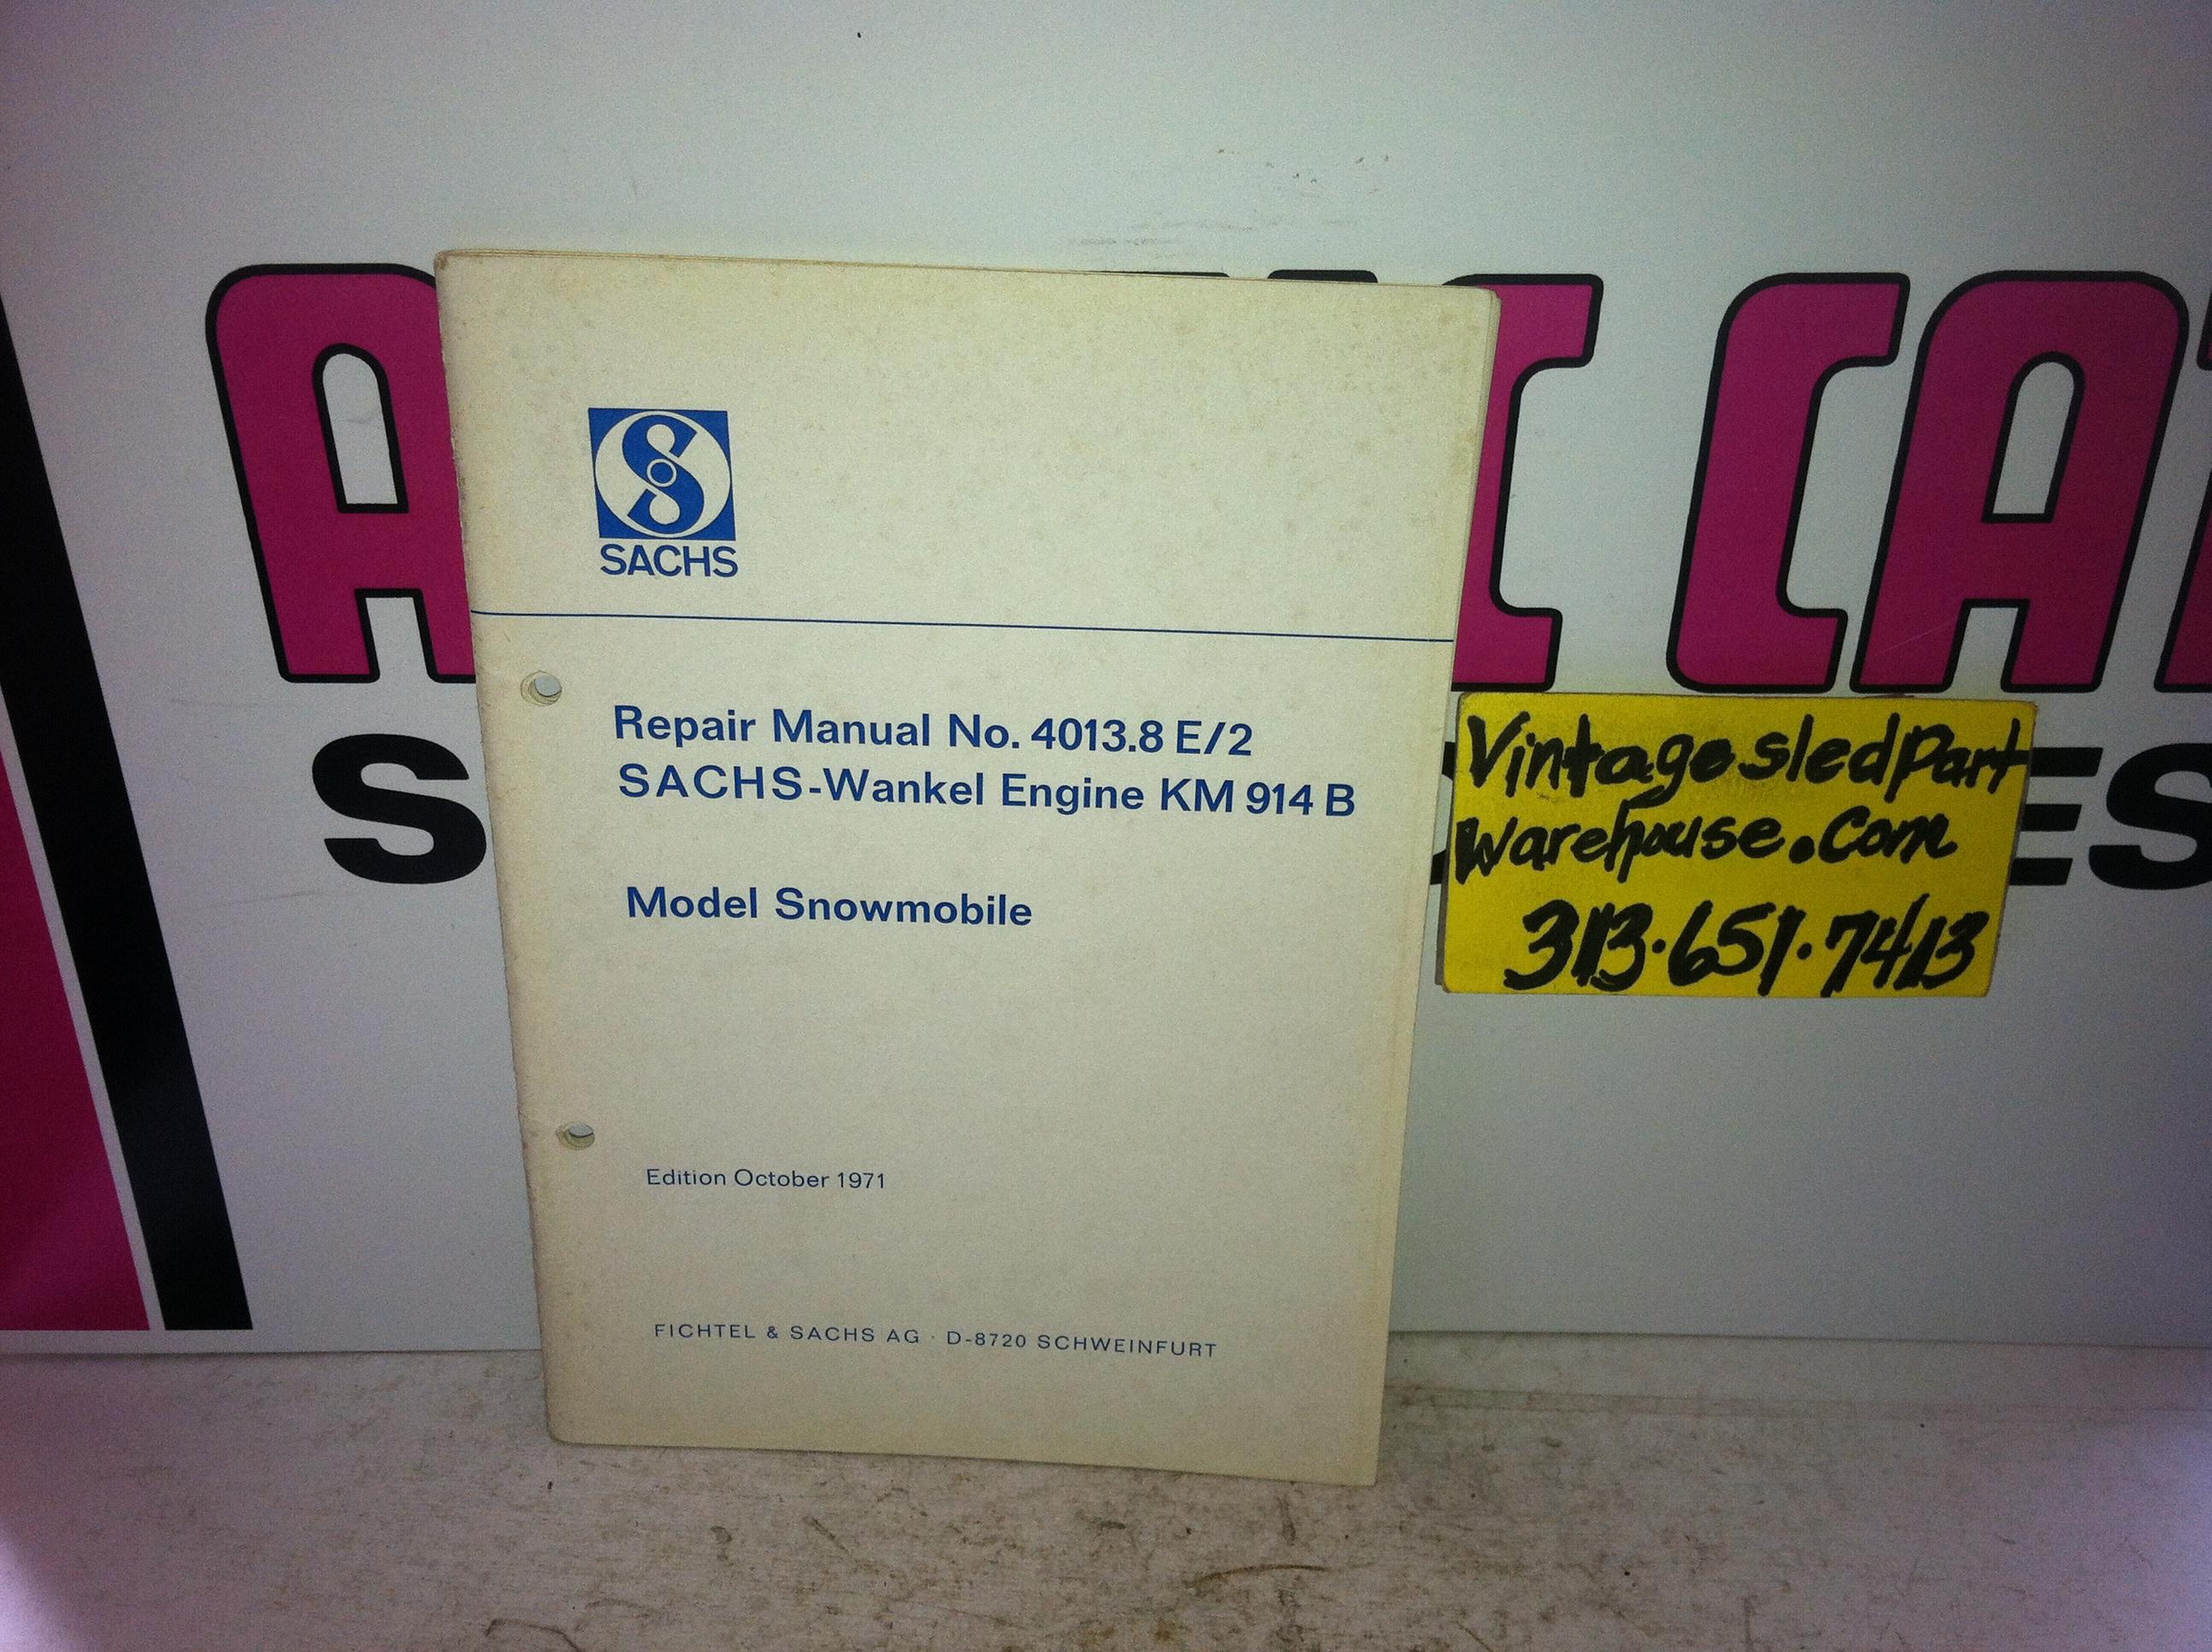 SACHS WANKEL KM 914B ENGINE PARTS BOOK VINTAGE SNOWMOBILE SACHS